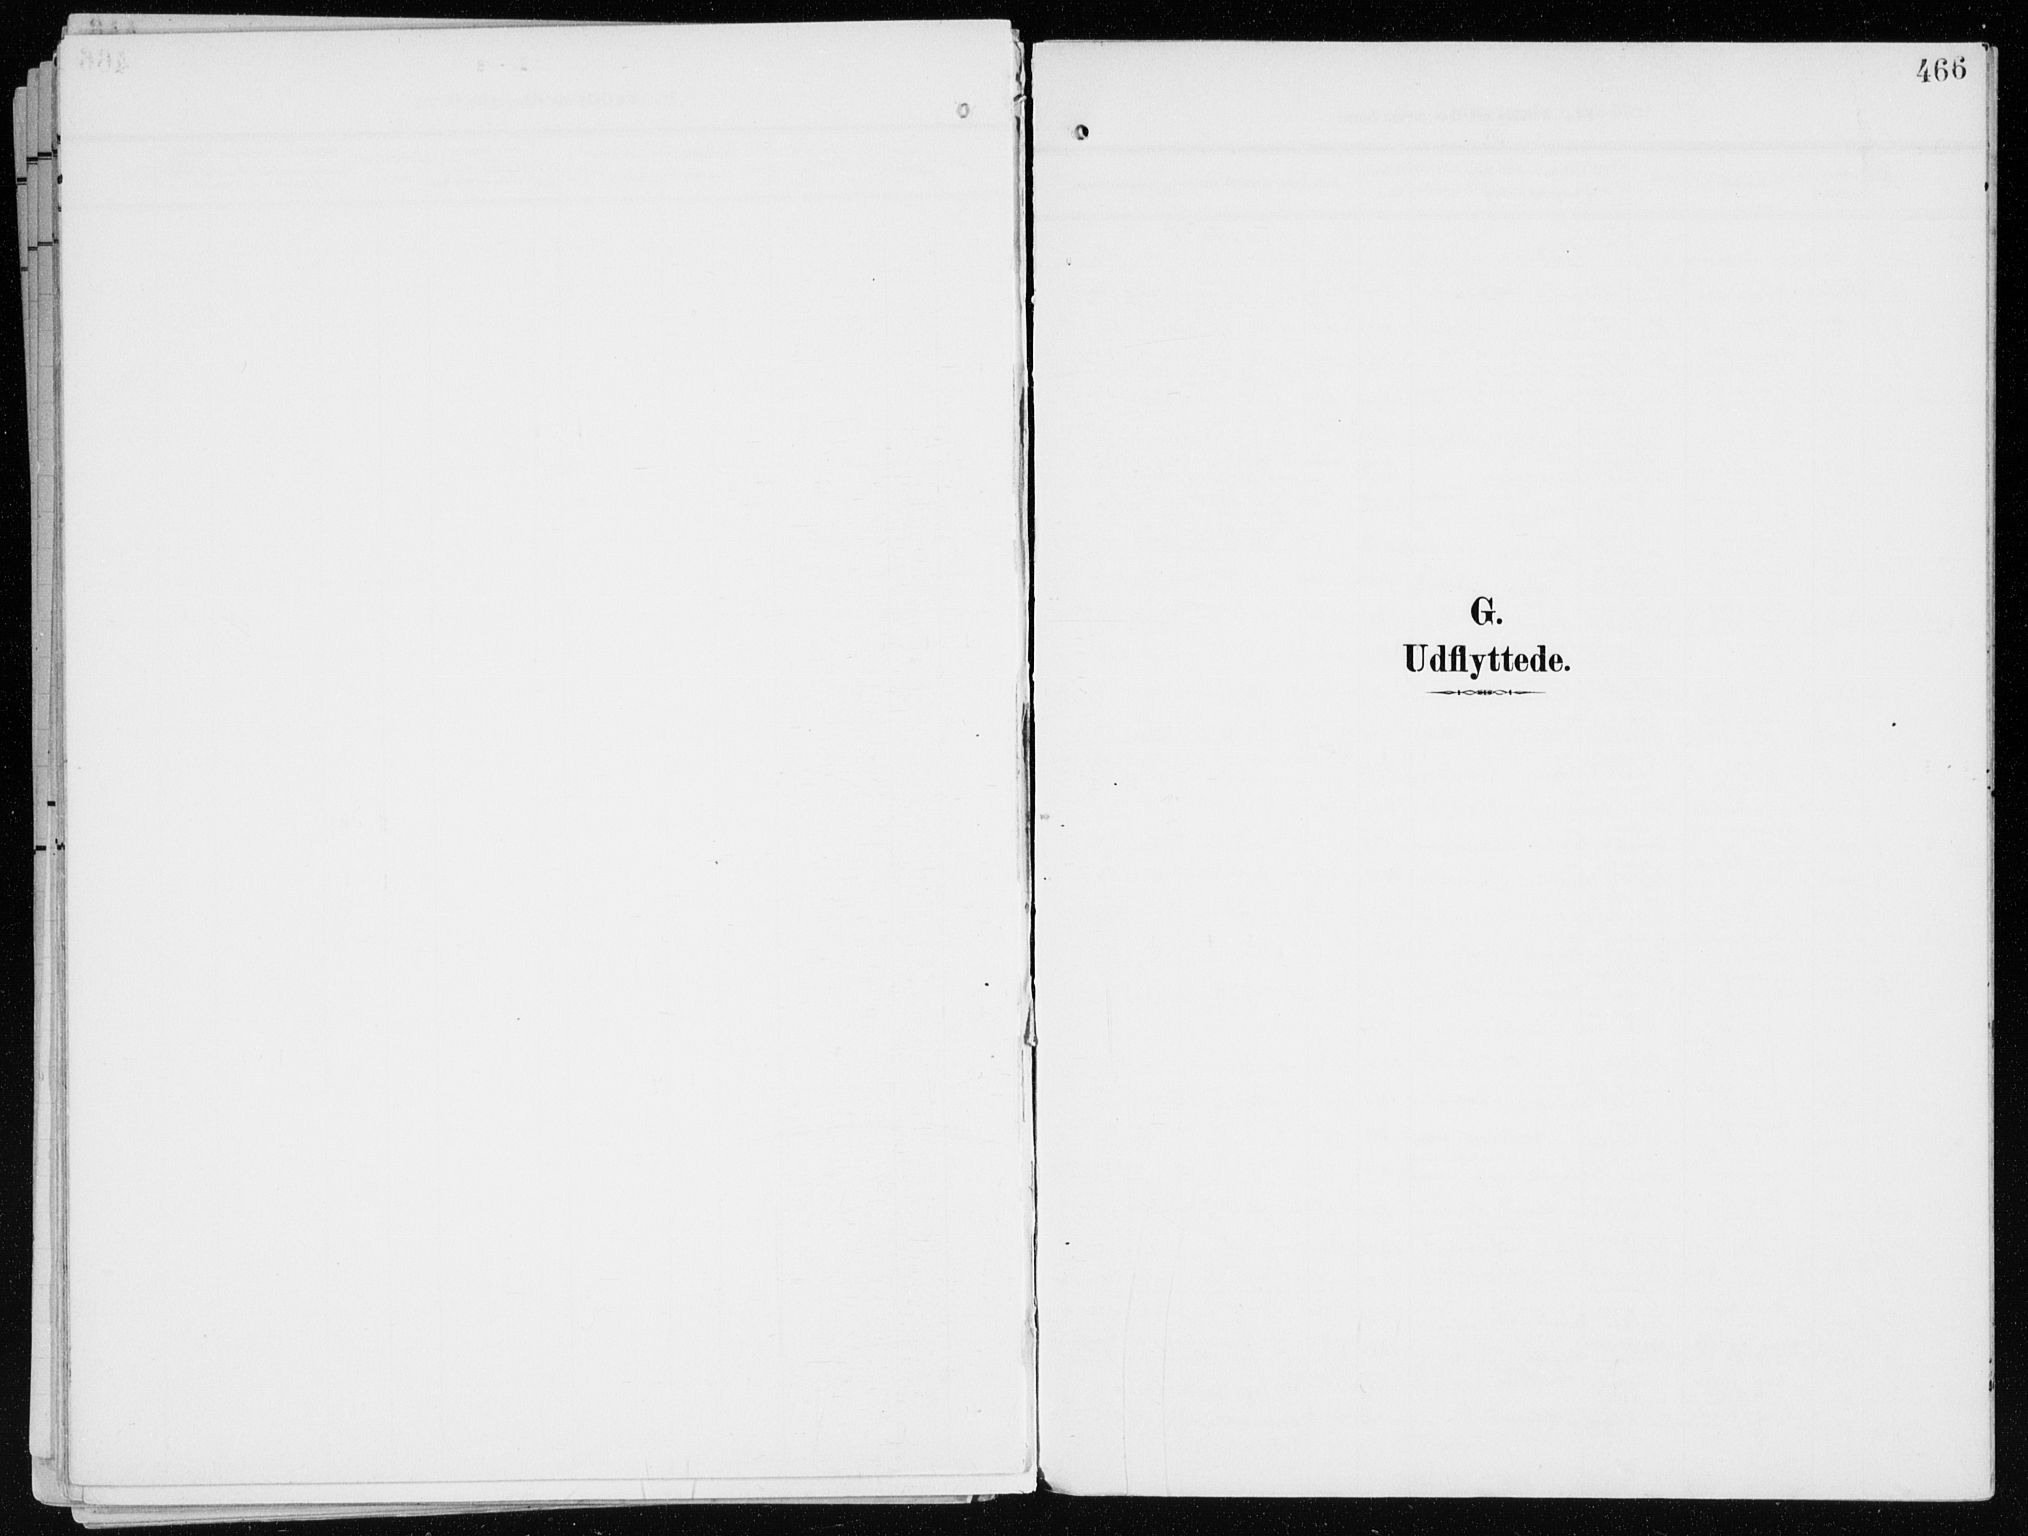 SAH, Furnes prestekontor, K/Ka/L0001: Ministerialbok nr. 1, 1907-1935, s. 466